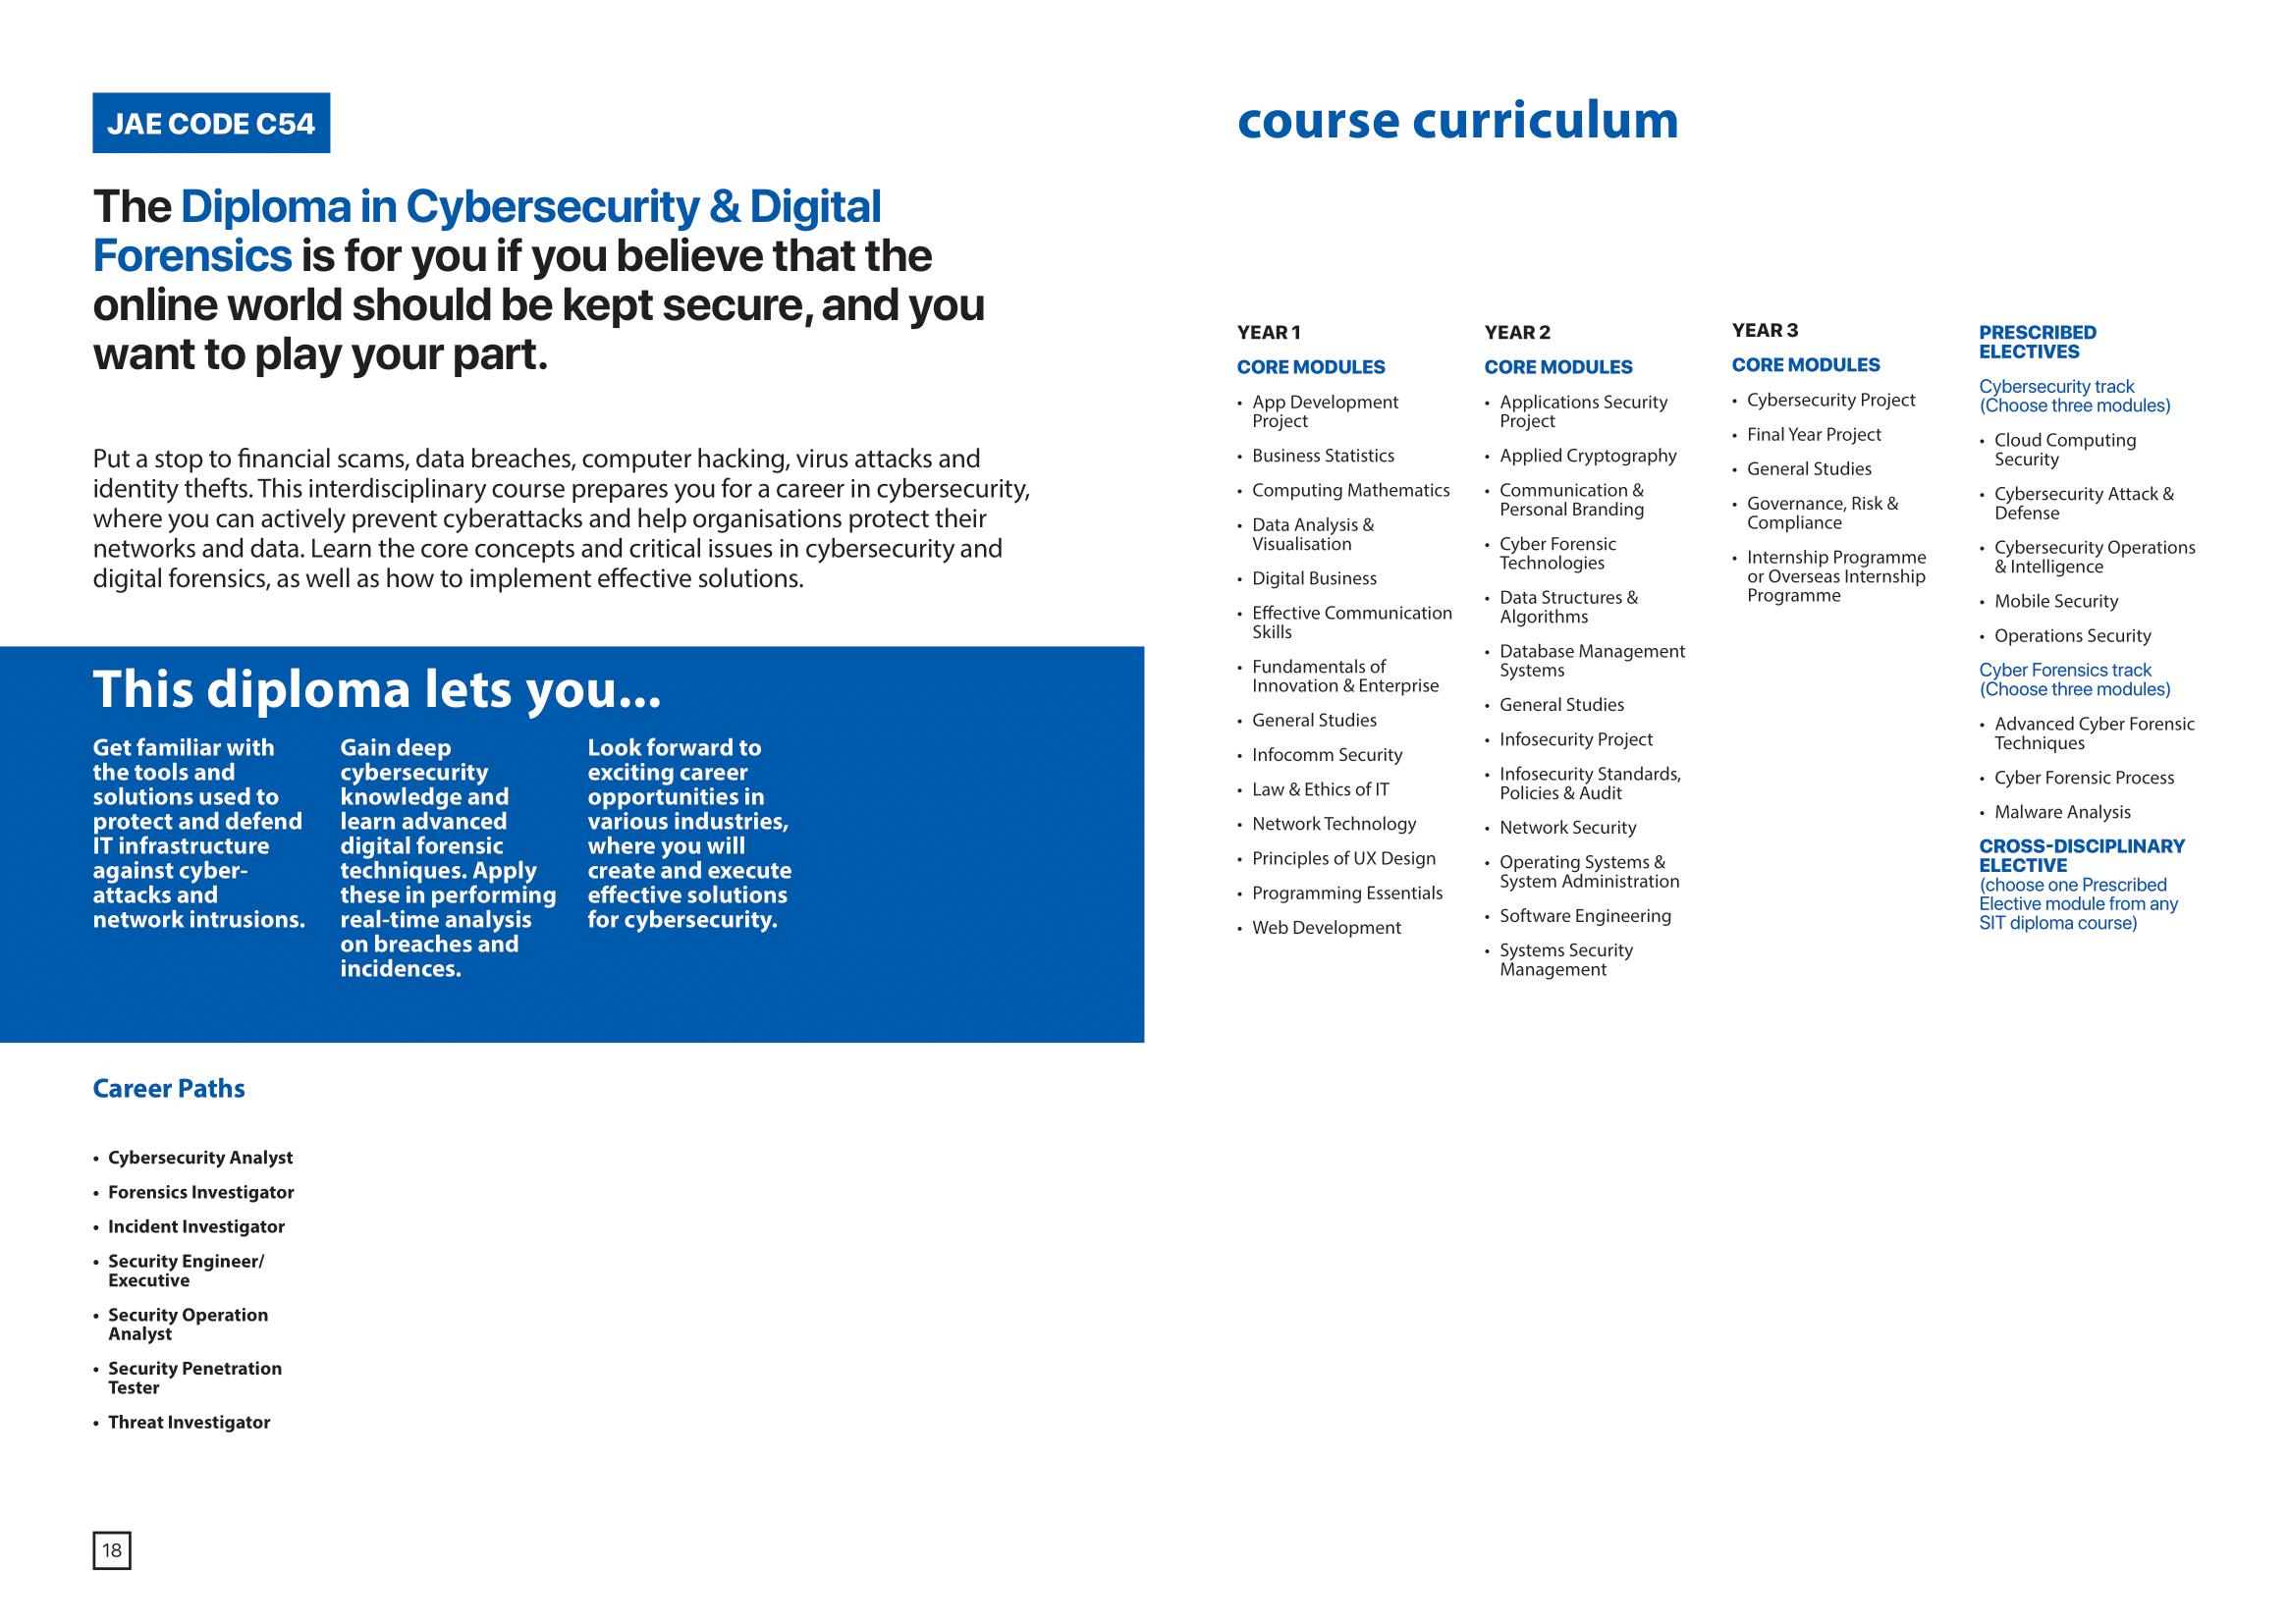 School of Information Technology 2020-11